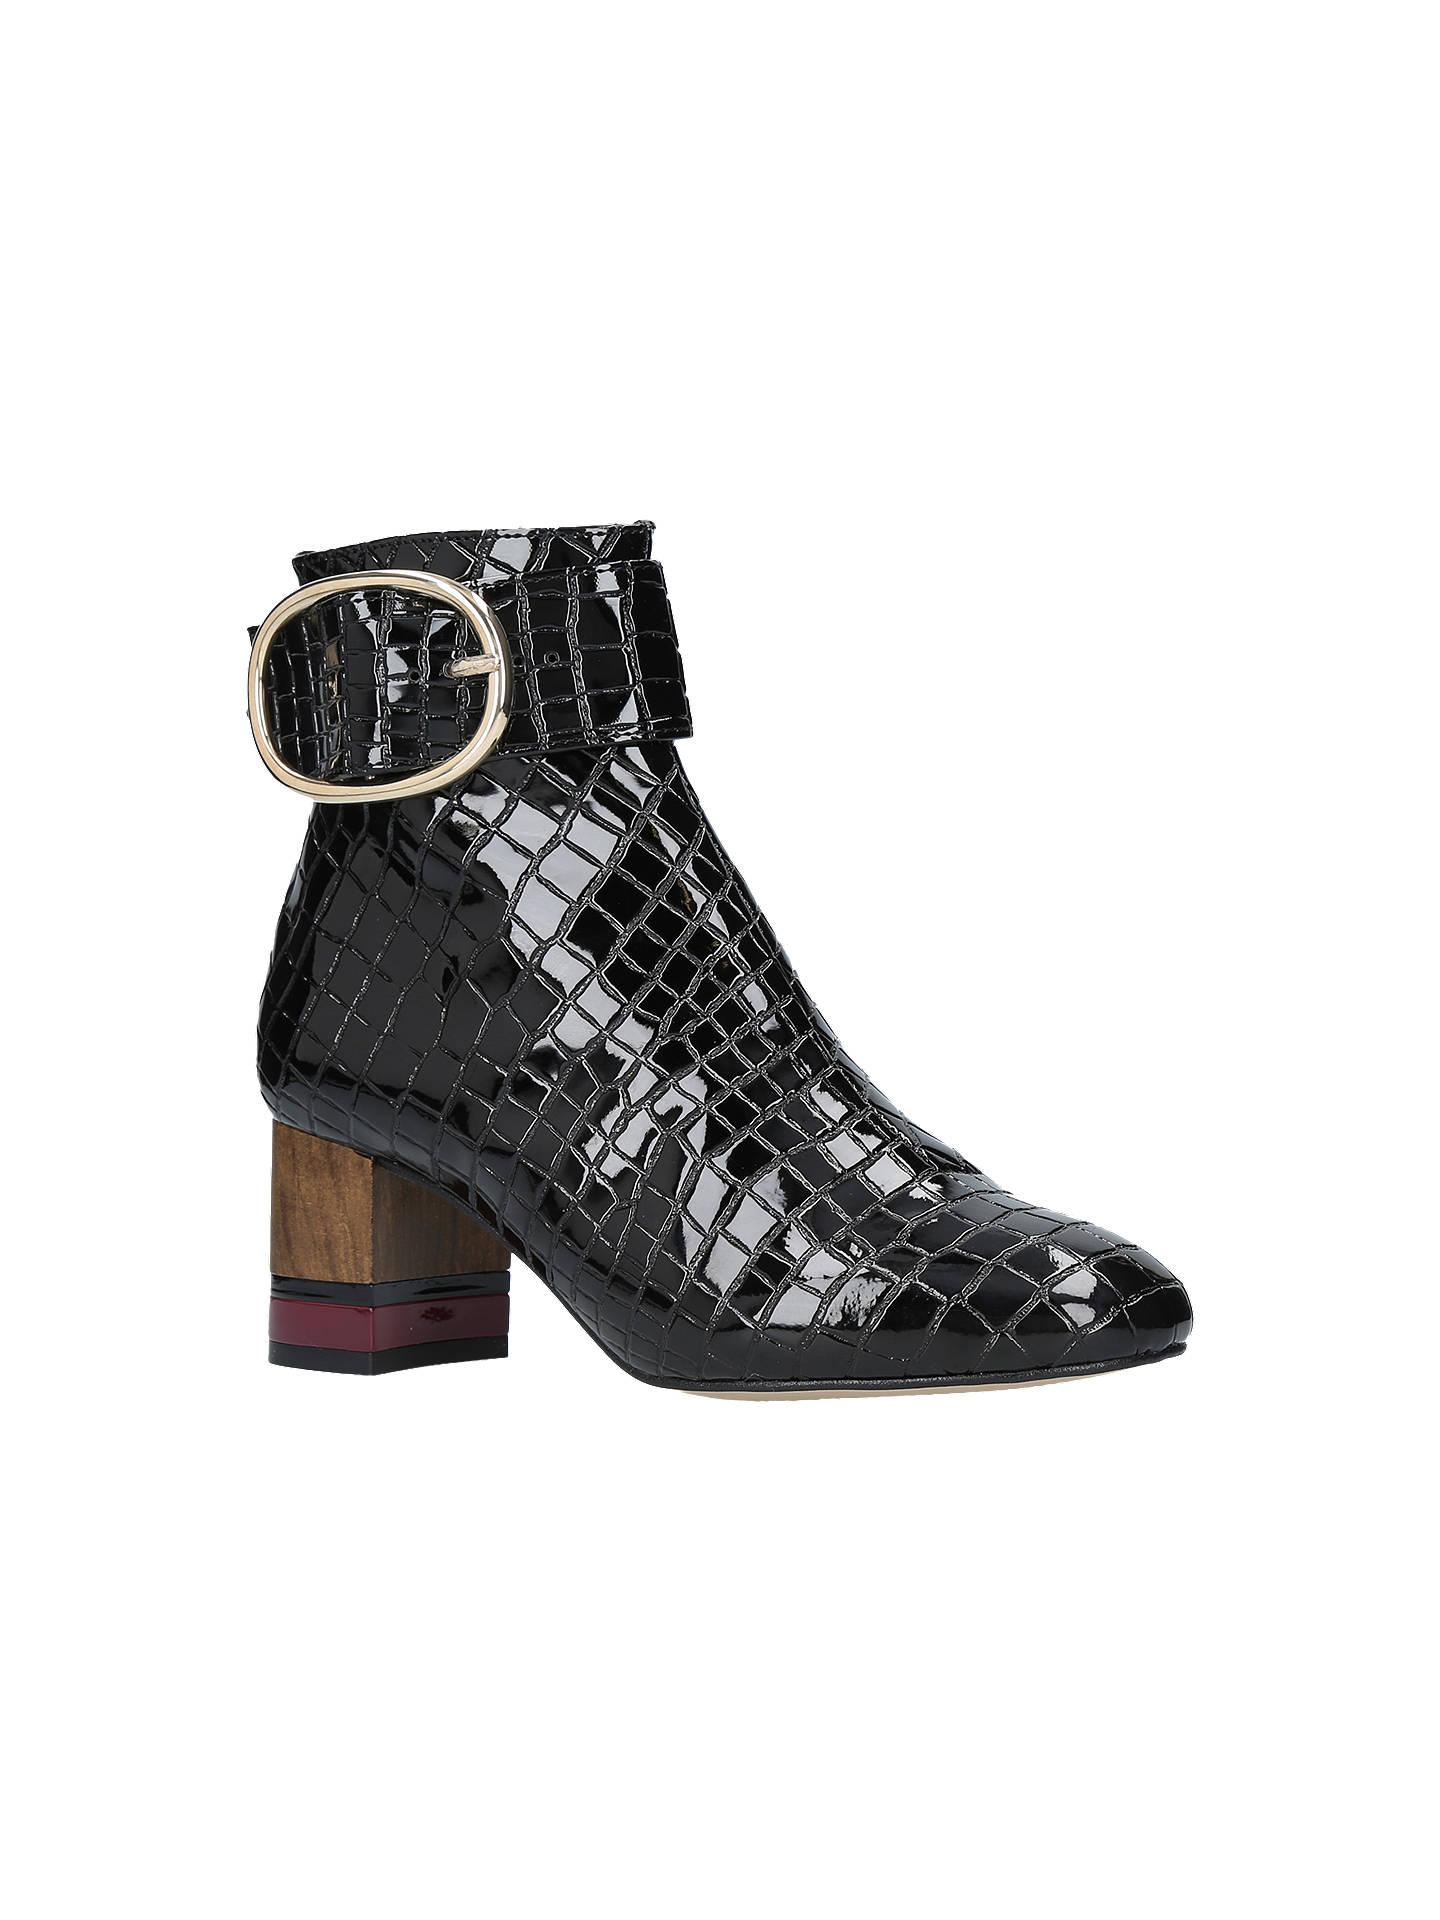 7d931a3841c Kurt Geiger London Ringo Block Heeled Ankle Boots, Patent Black